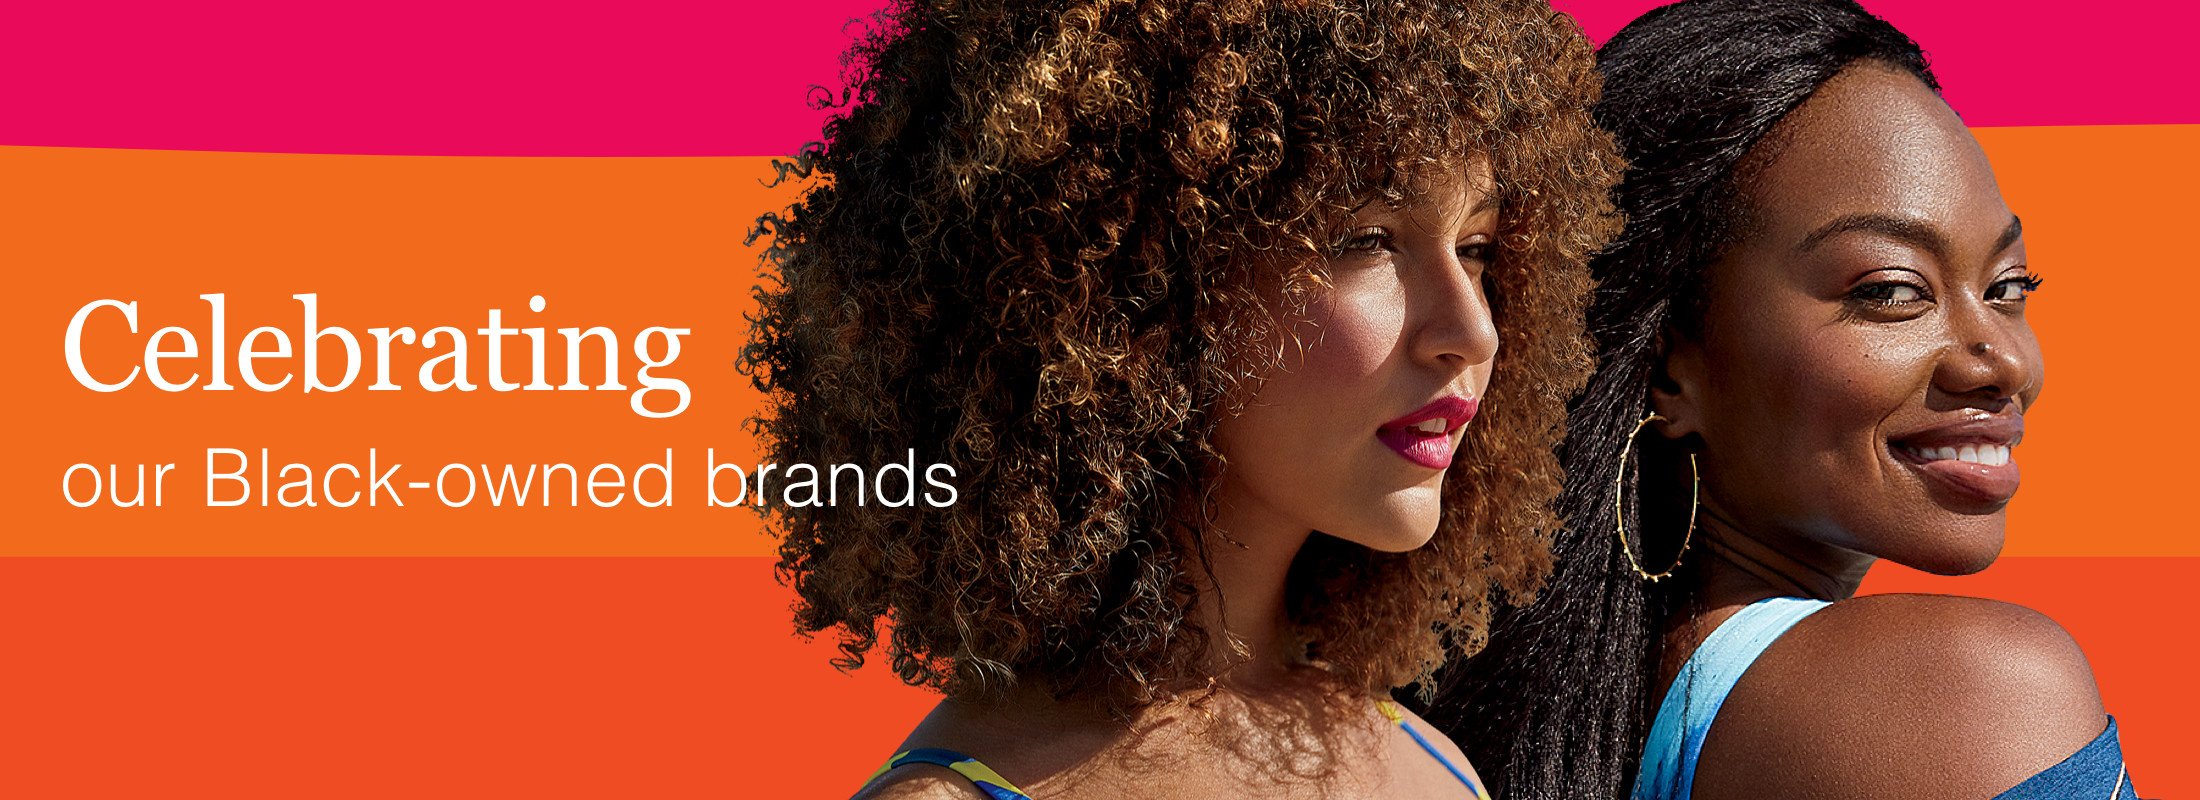 Black-owned brands